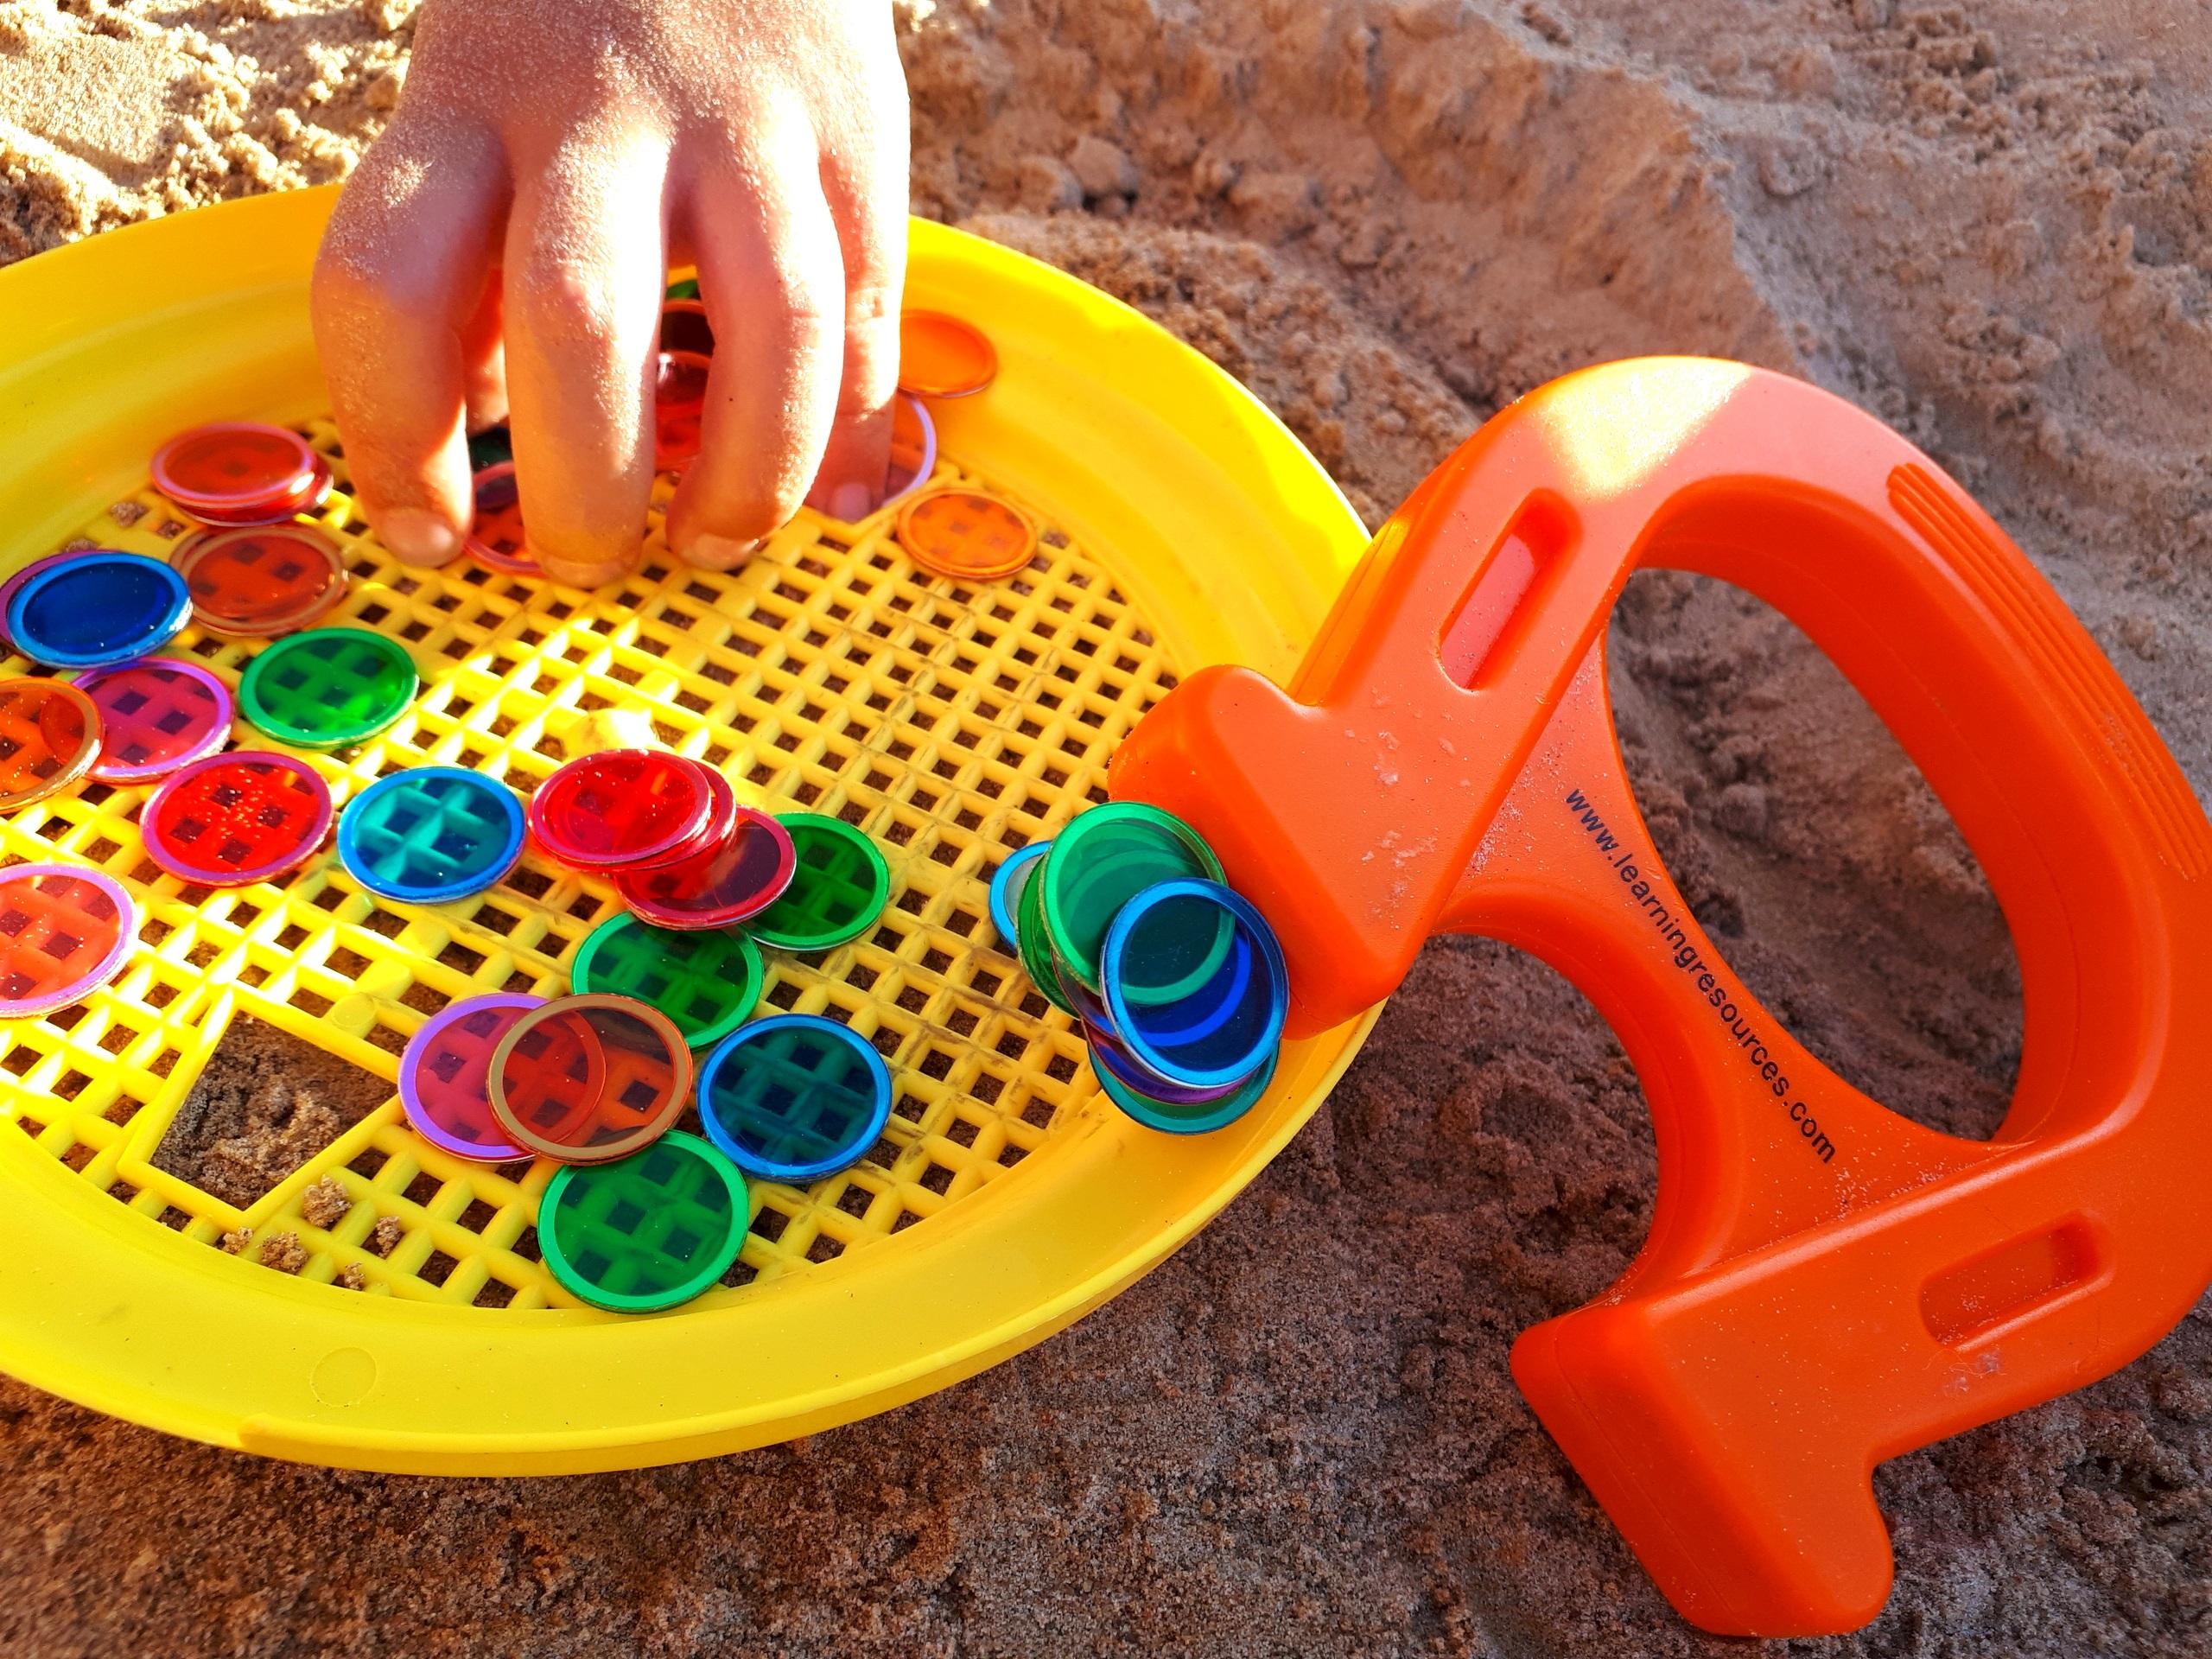 Притягиваем интерес малыша. Идеи игр с магнитами Learning Resources.